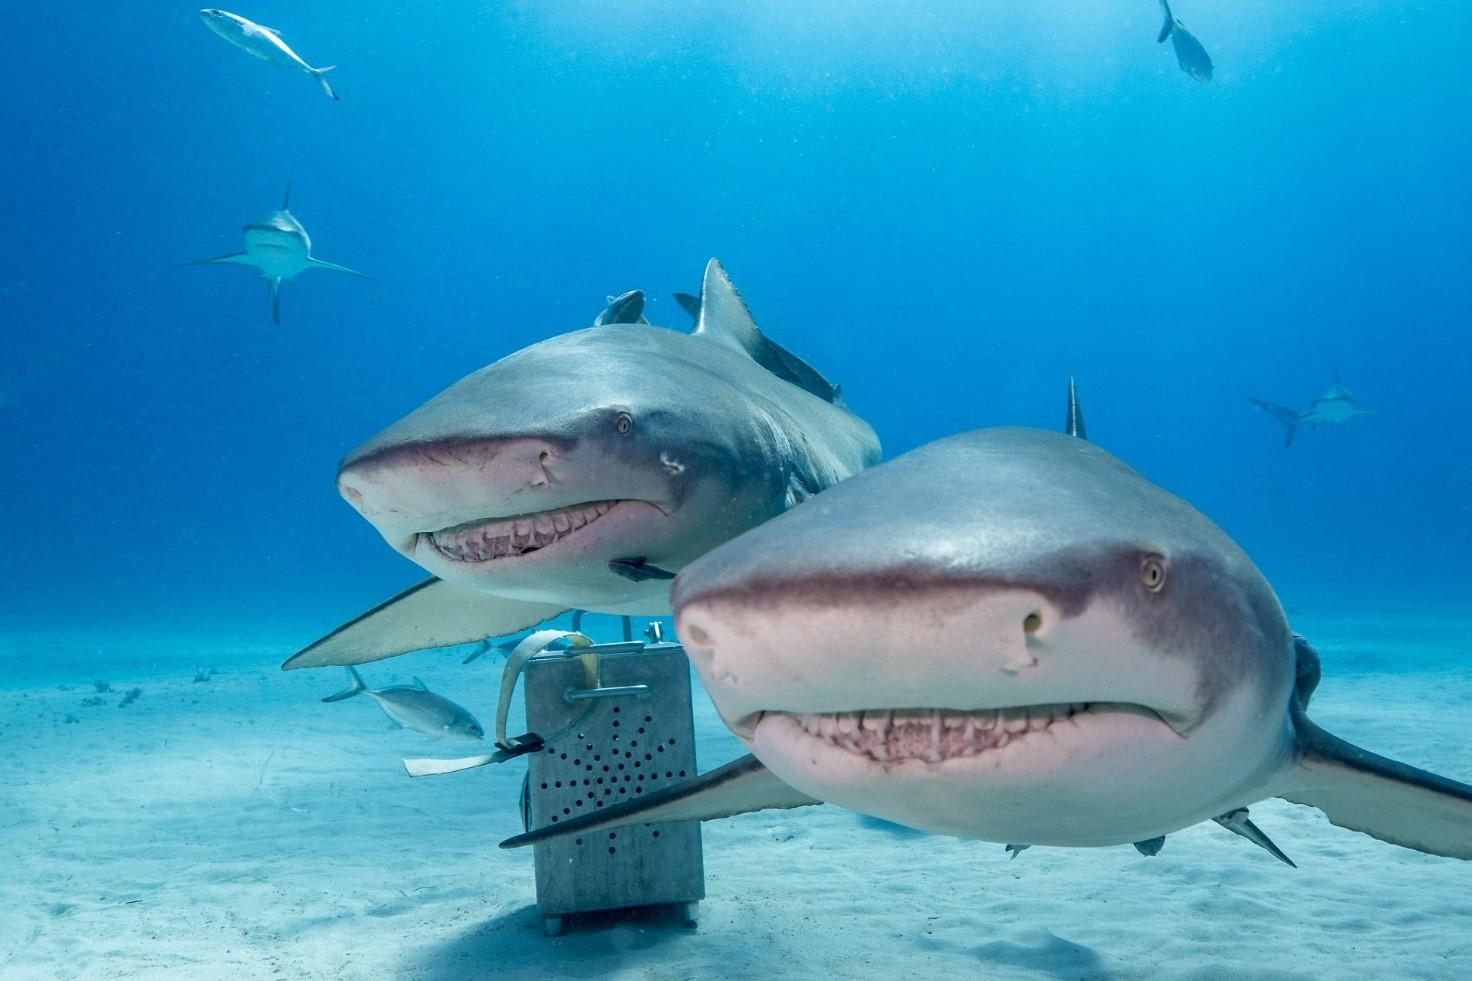 Dwa żółte rekiny